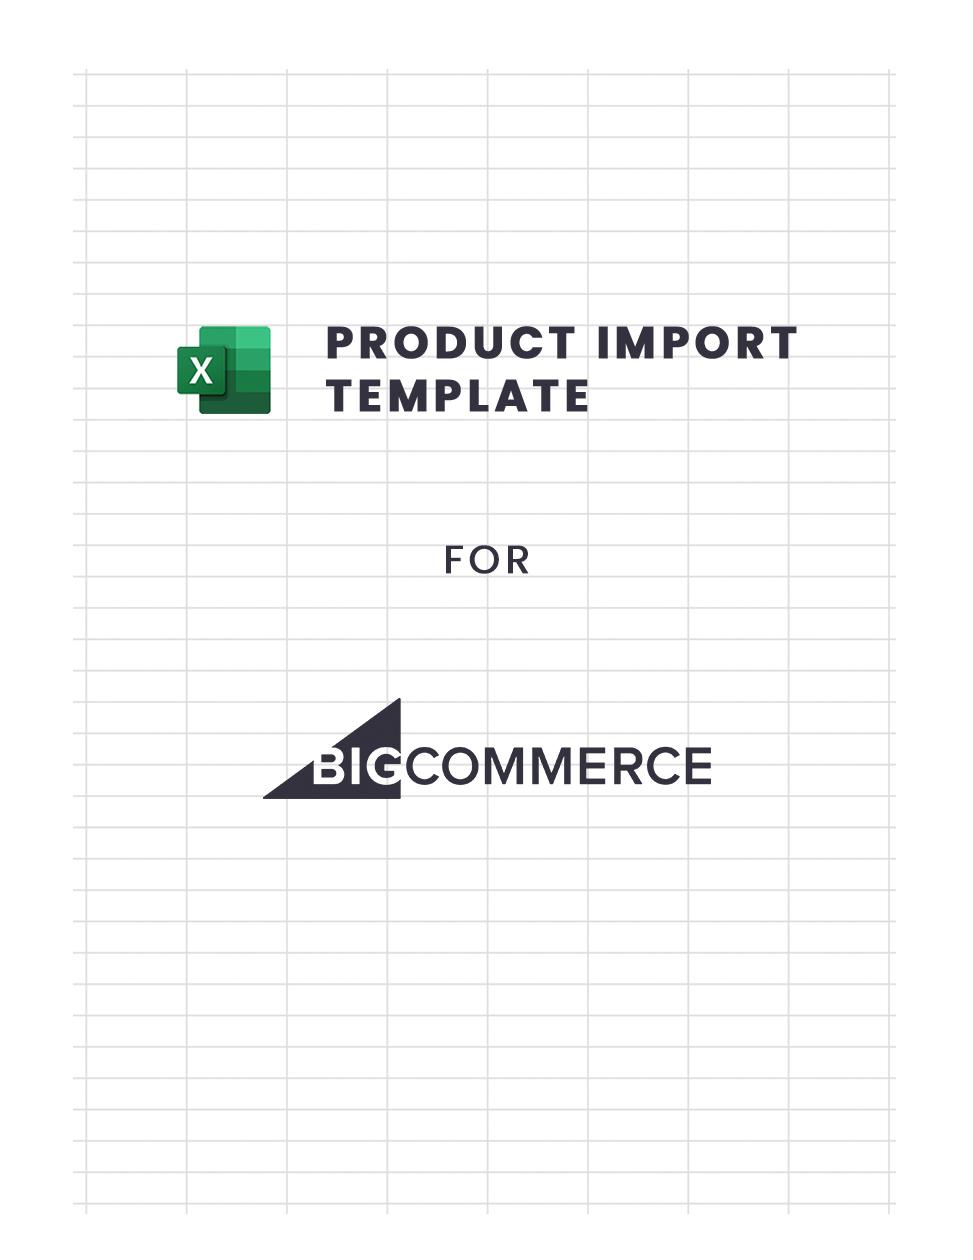 bigcommerce-template